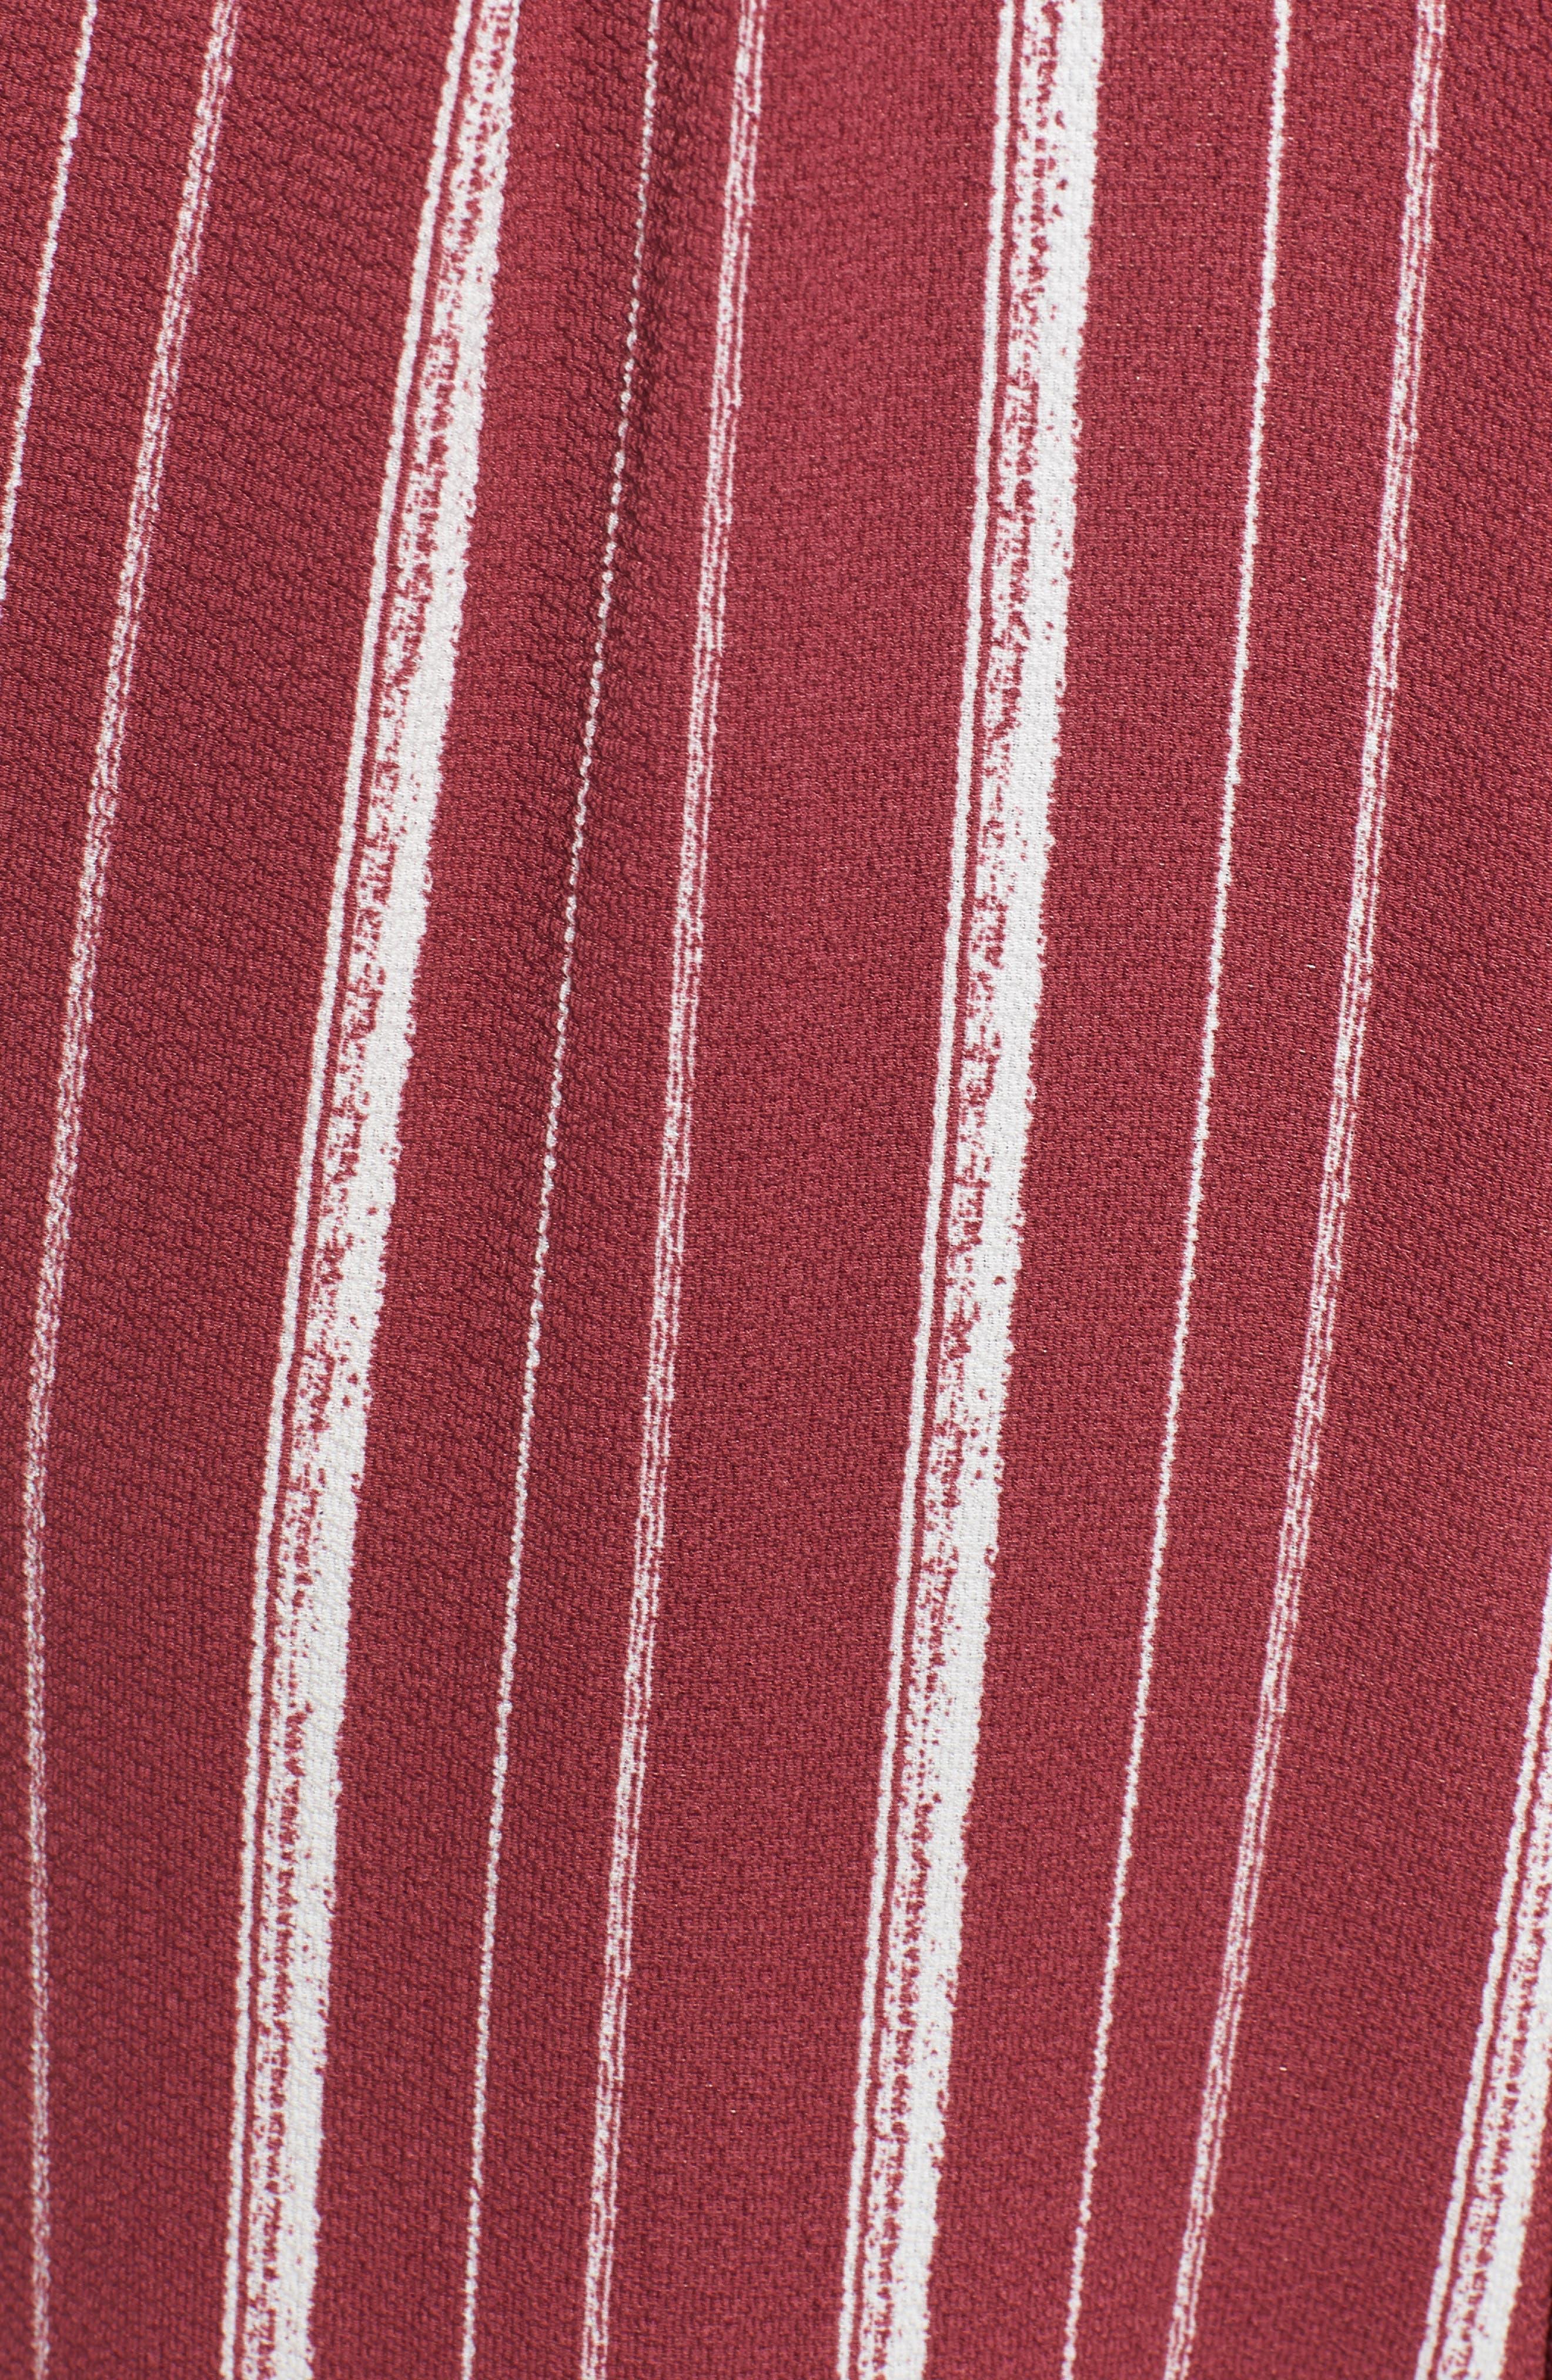 Stripe Jumpsuit,                             Alternate thumbnail 6, color,                             WINE